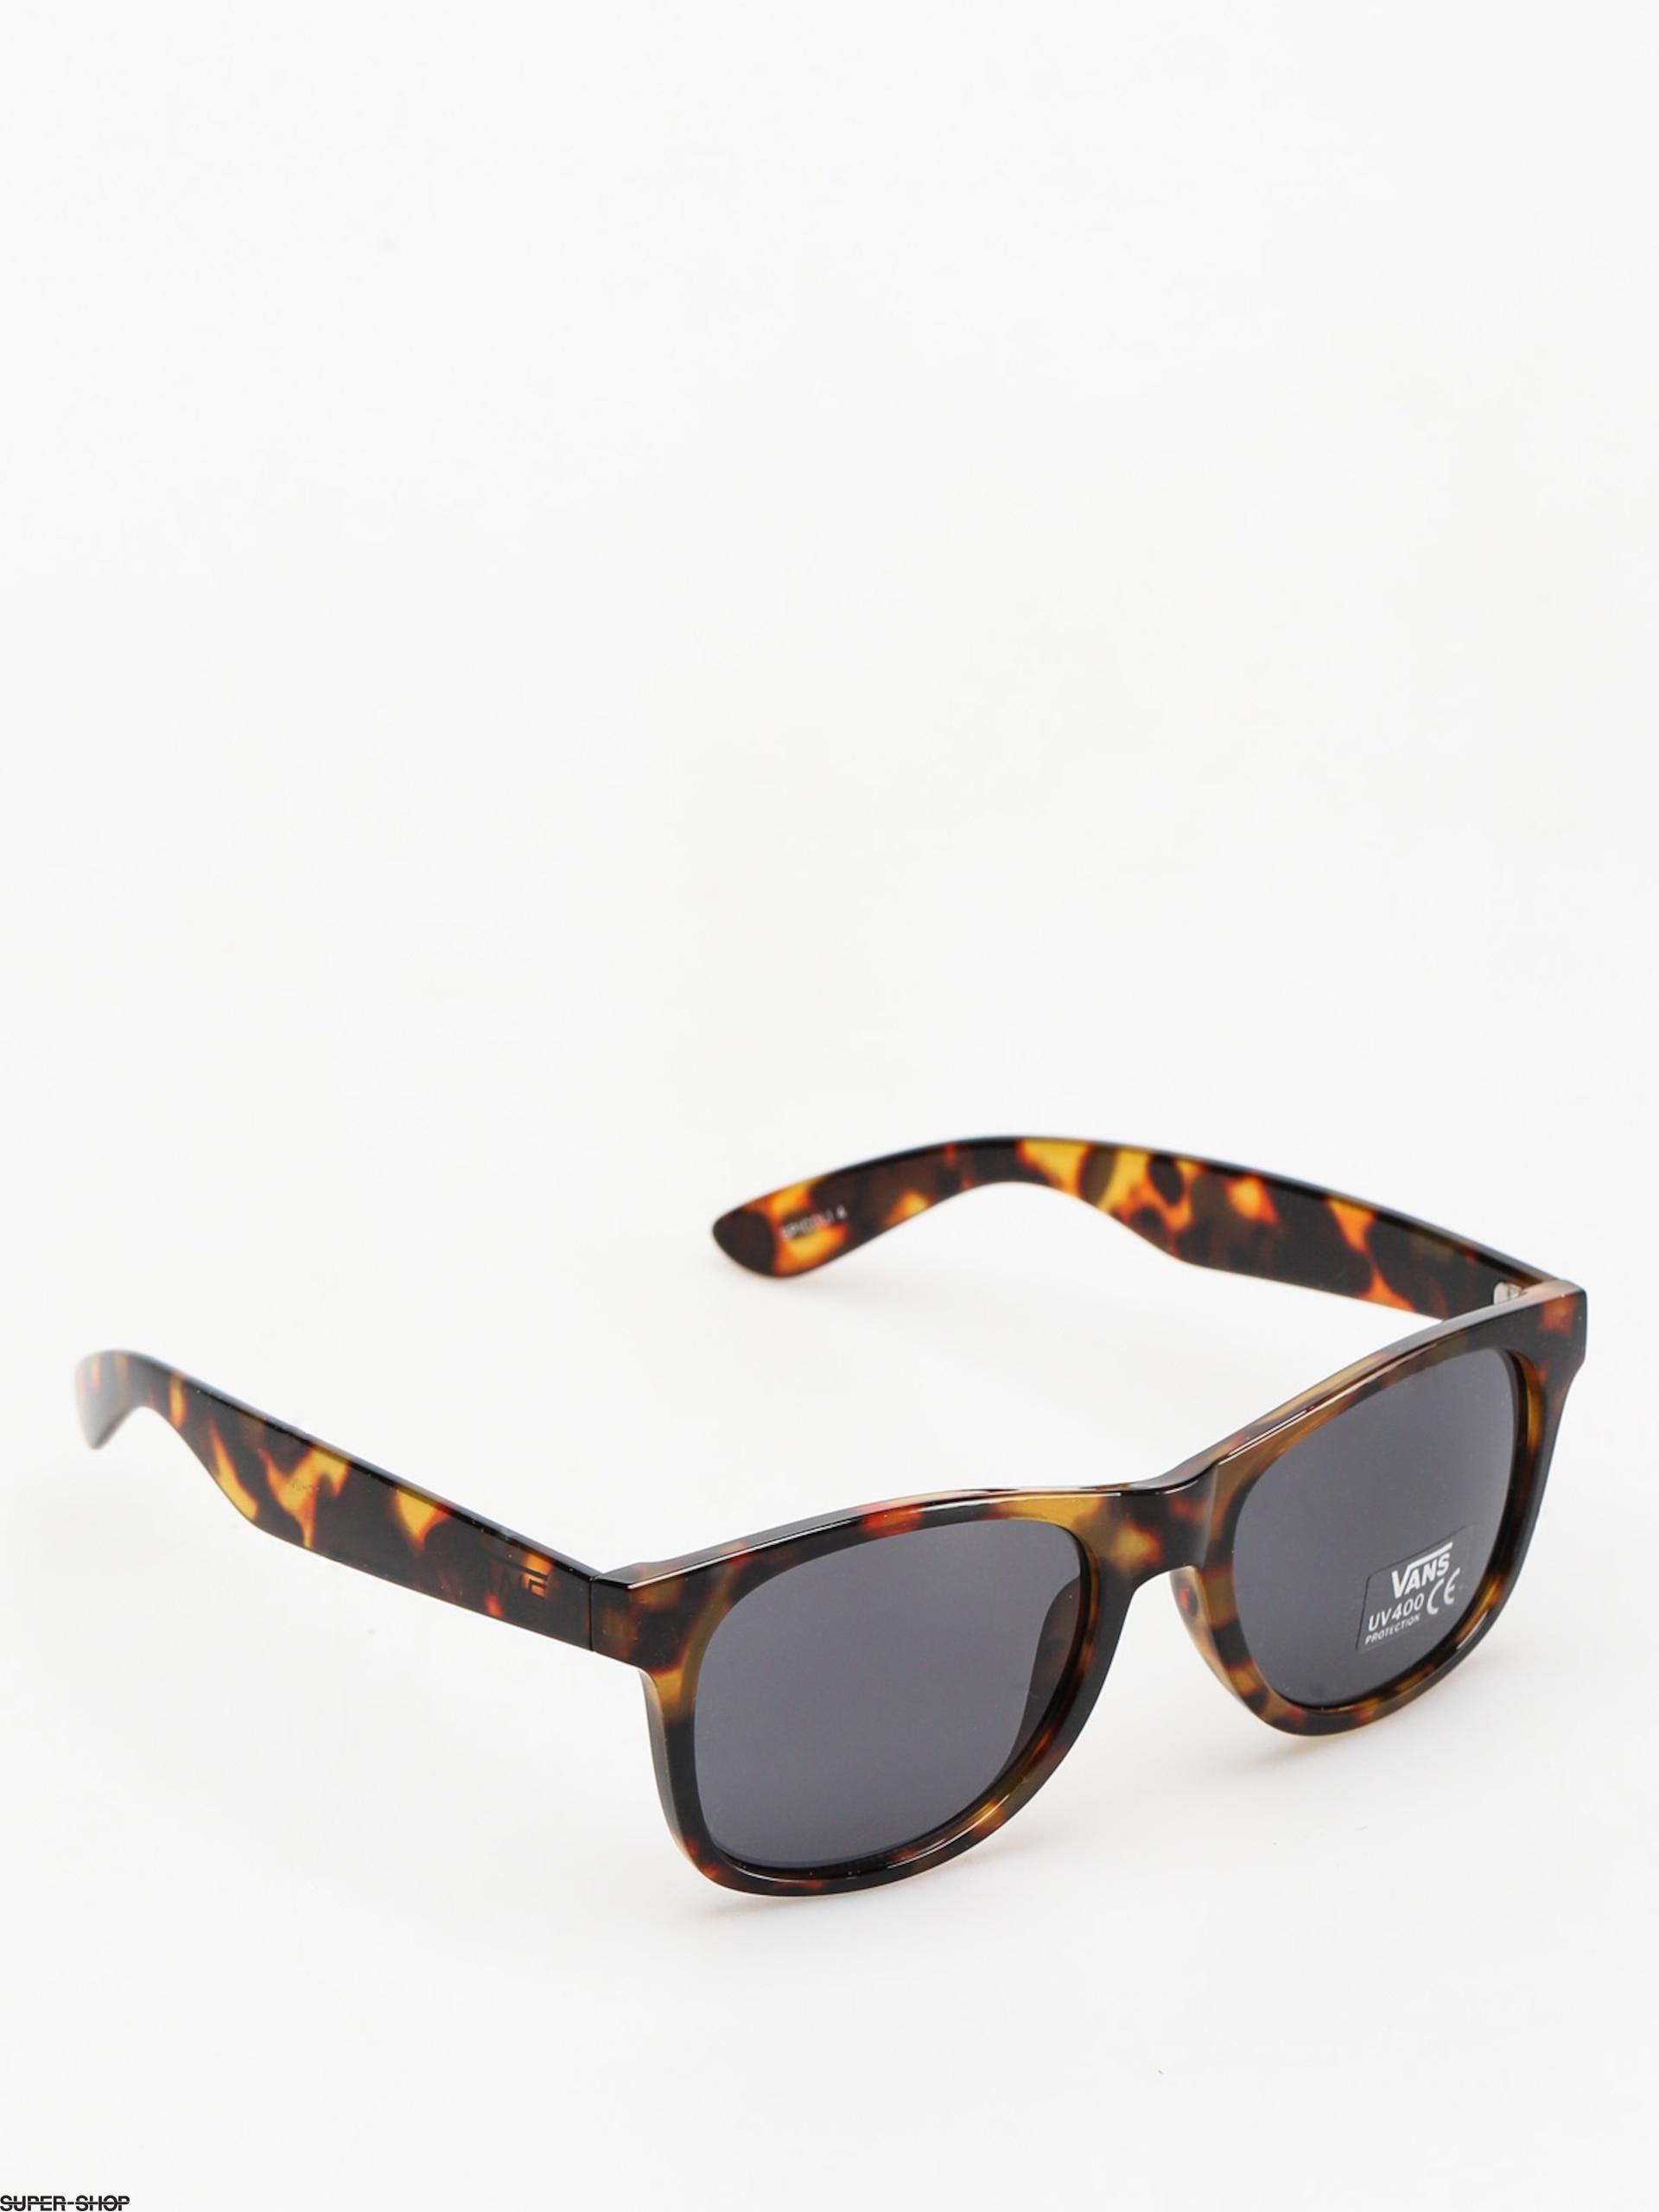 c1bb31ae51 948945-w1920-vans-sunglasses-spicoli-4-shades-cheetah-tortoise.jpg